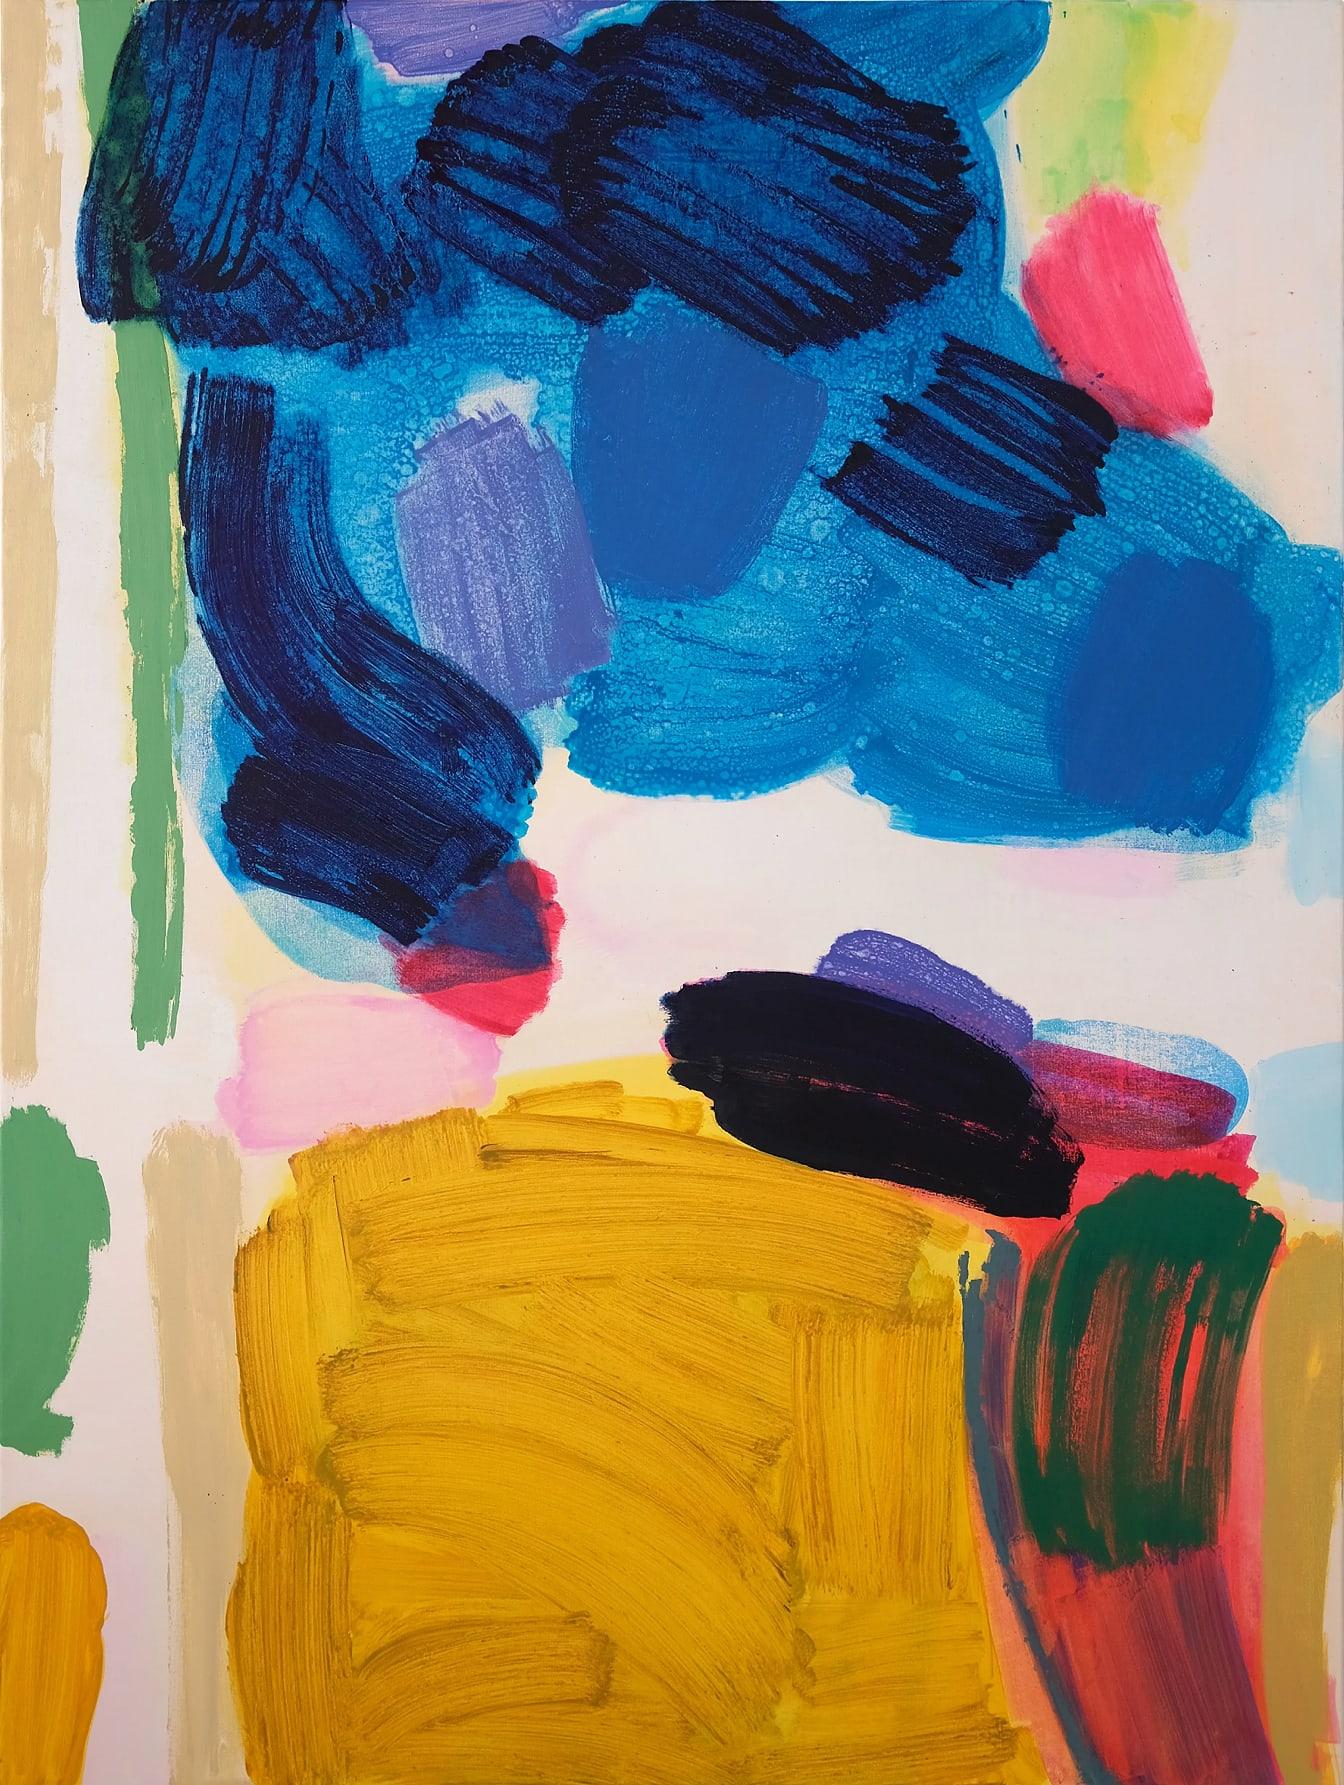 "<span class=""link fancybox-details-link""><a href=""/exhibitions/21/works/artworks1058/"">View Detail Page</a></span><div class=""artist""><strong>Tim Braden</strong></div><div class=""title""><em>Curacao</em>, 2019</div><div class=""medium"">OIl on canvas</div><div class=""dimensions"">160x120cm (63x47"")</div>"